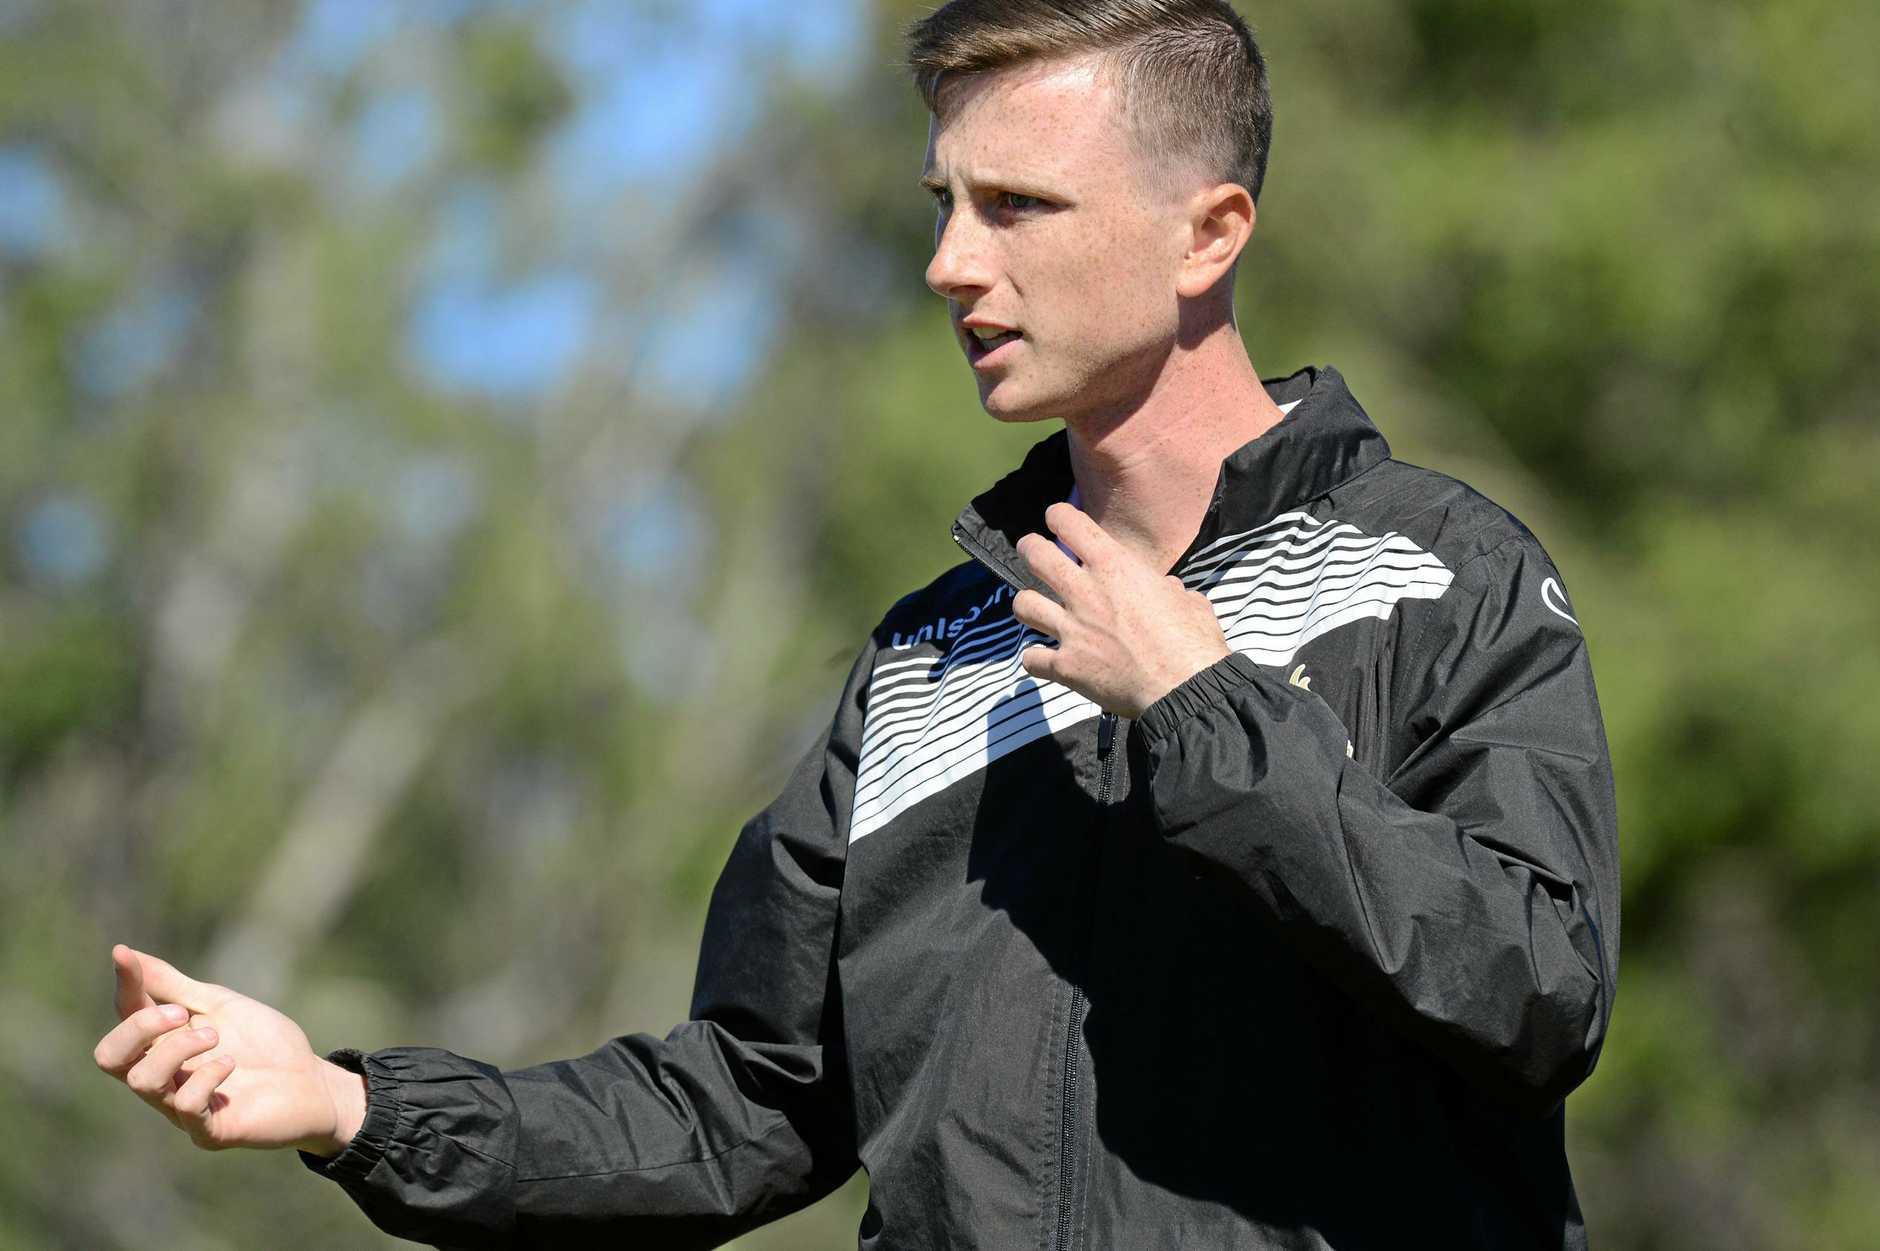 U18's soccer match between Western Pride Vs South West Queensland at Briggs Road Sporting Complex. Pride coach Jordan Manning.